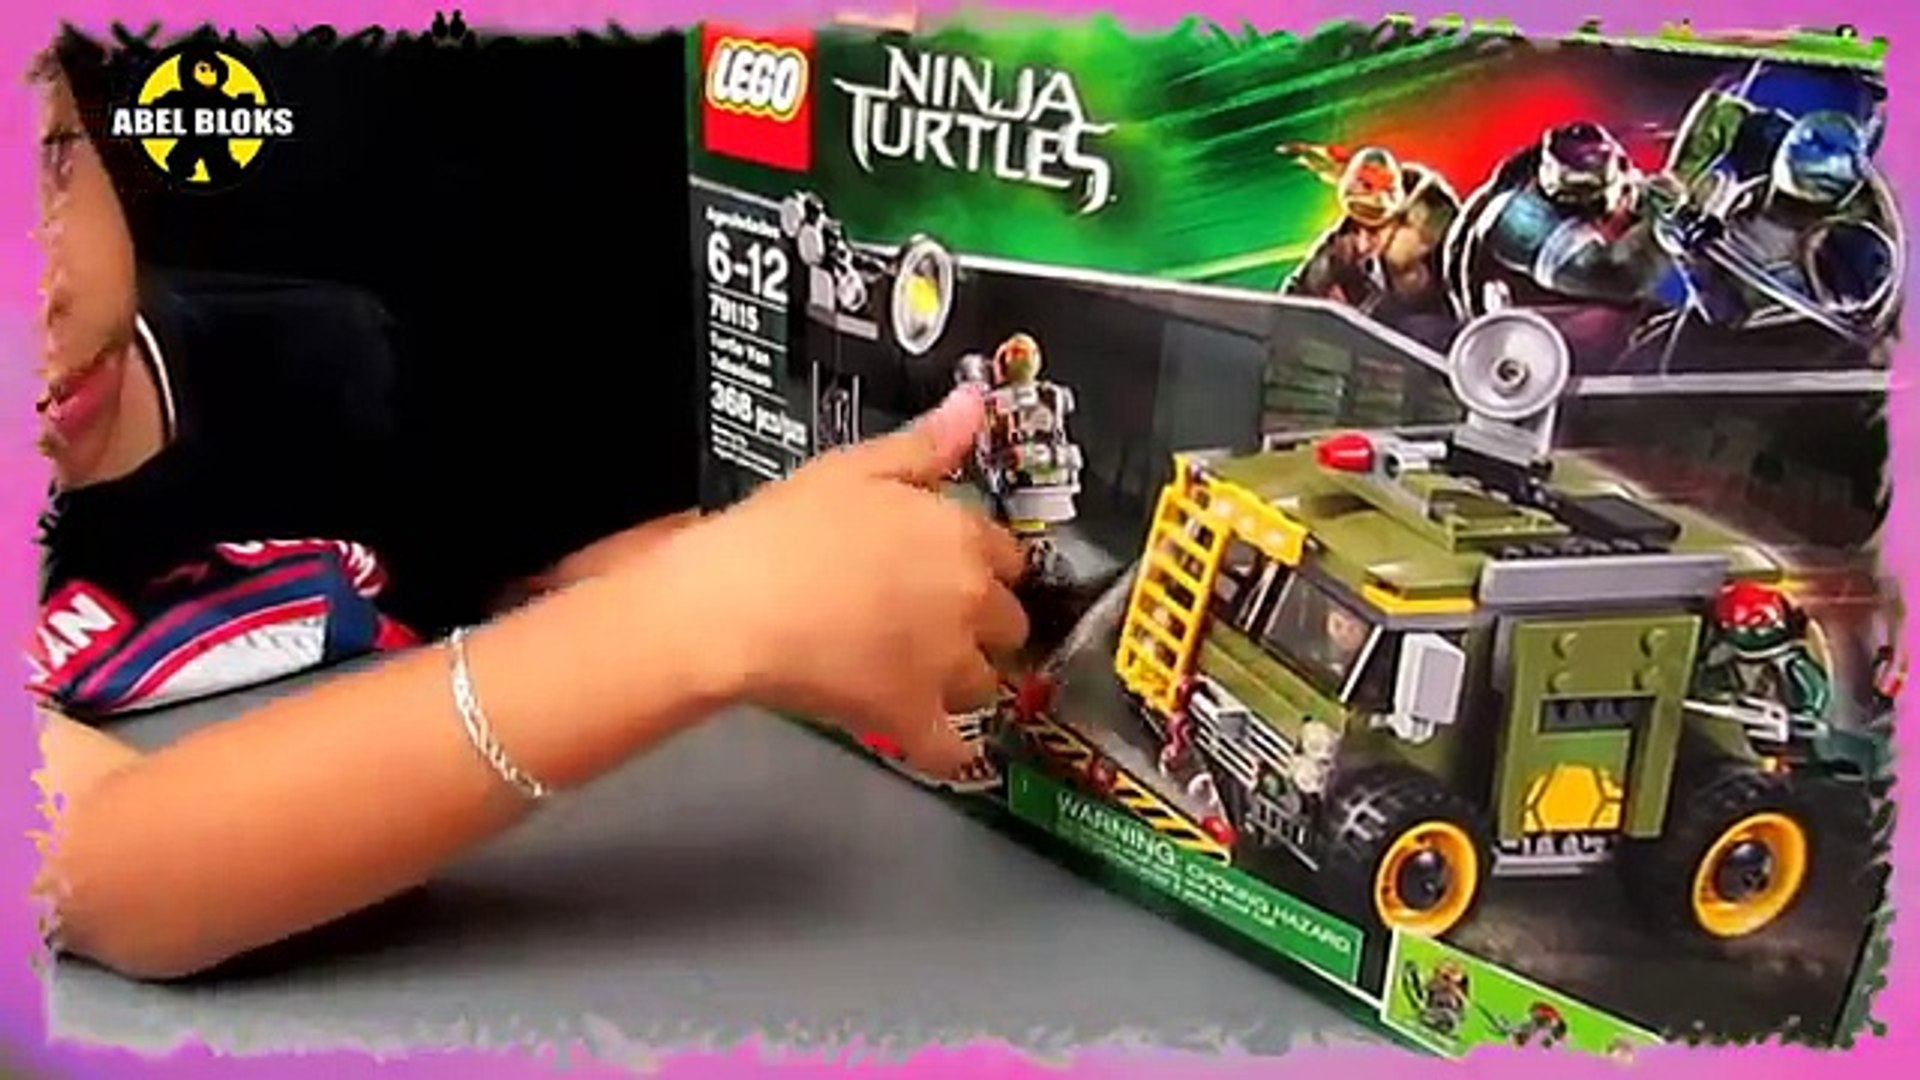 En Tortugalego Takedown 79115Turtle Van Lego EspañolCamioneta nwO0P8k